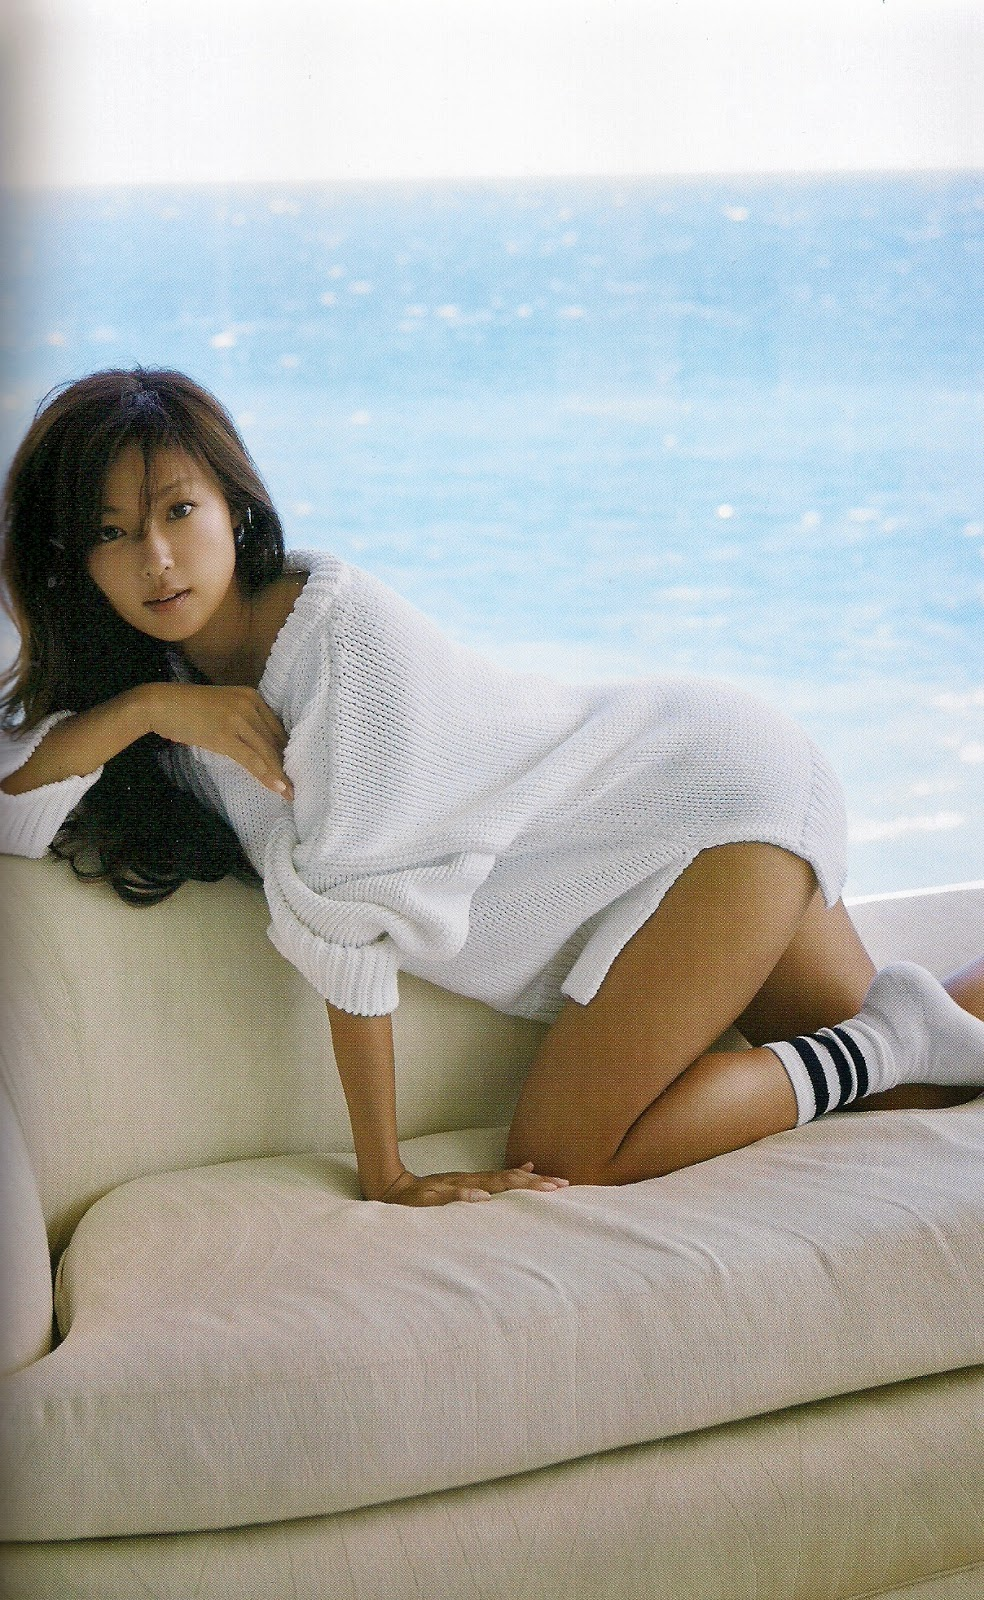 Who is Kyoko Fukada Who is Kyoko Fukada Dating Net Worth